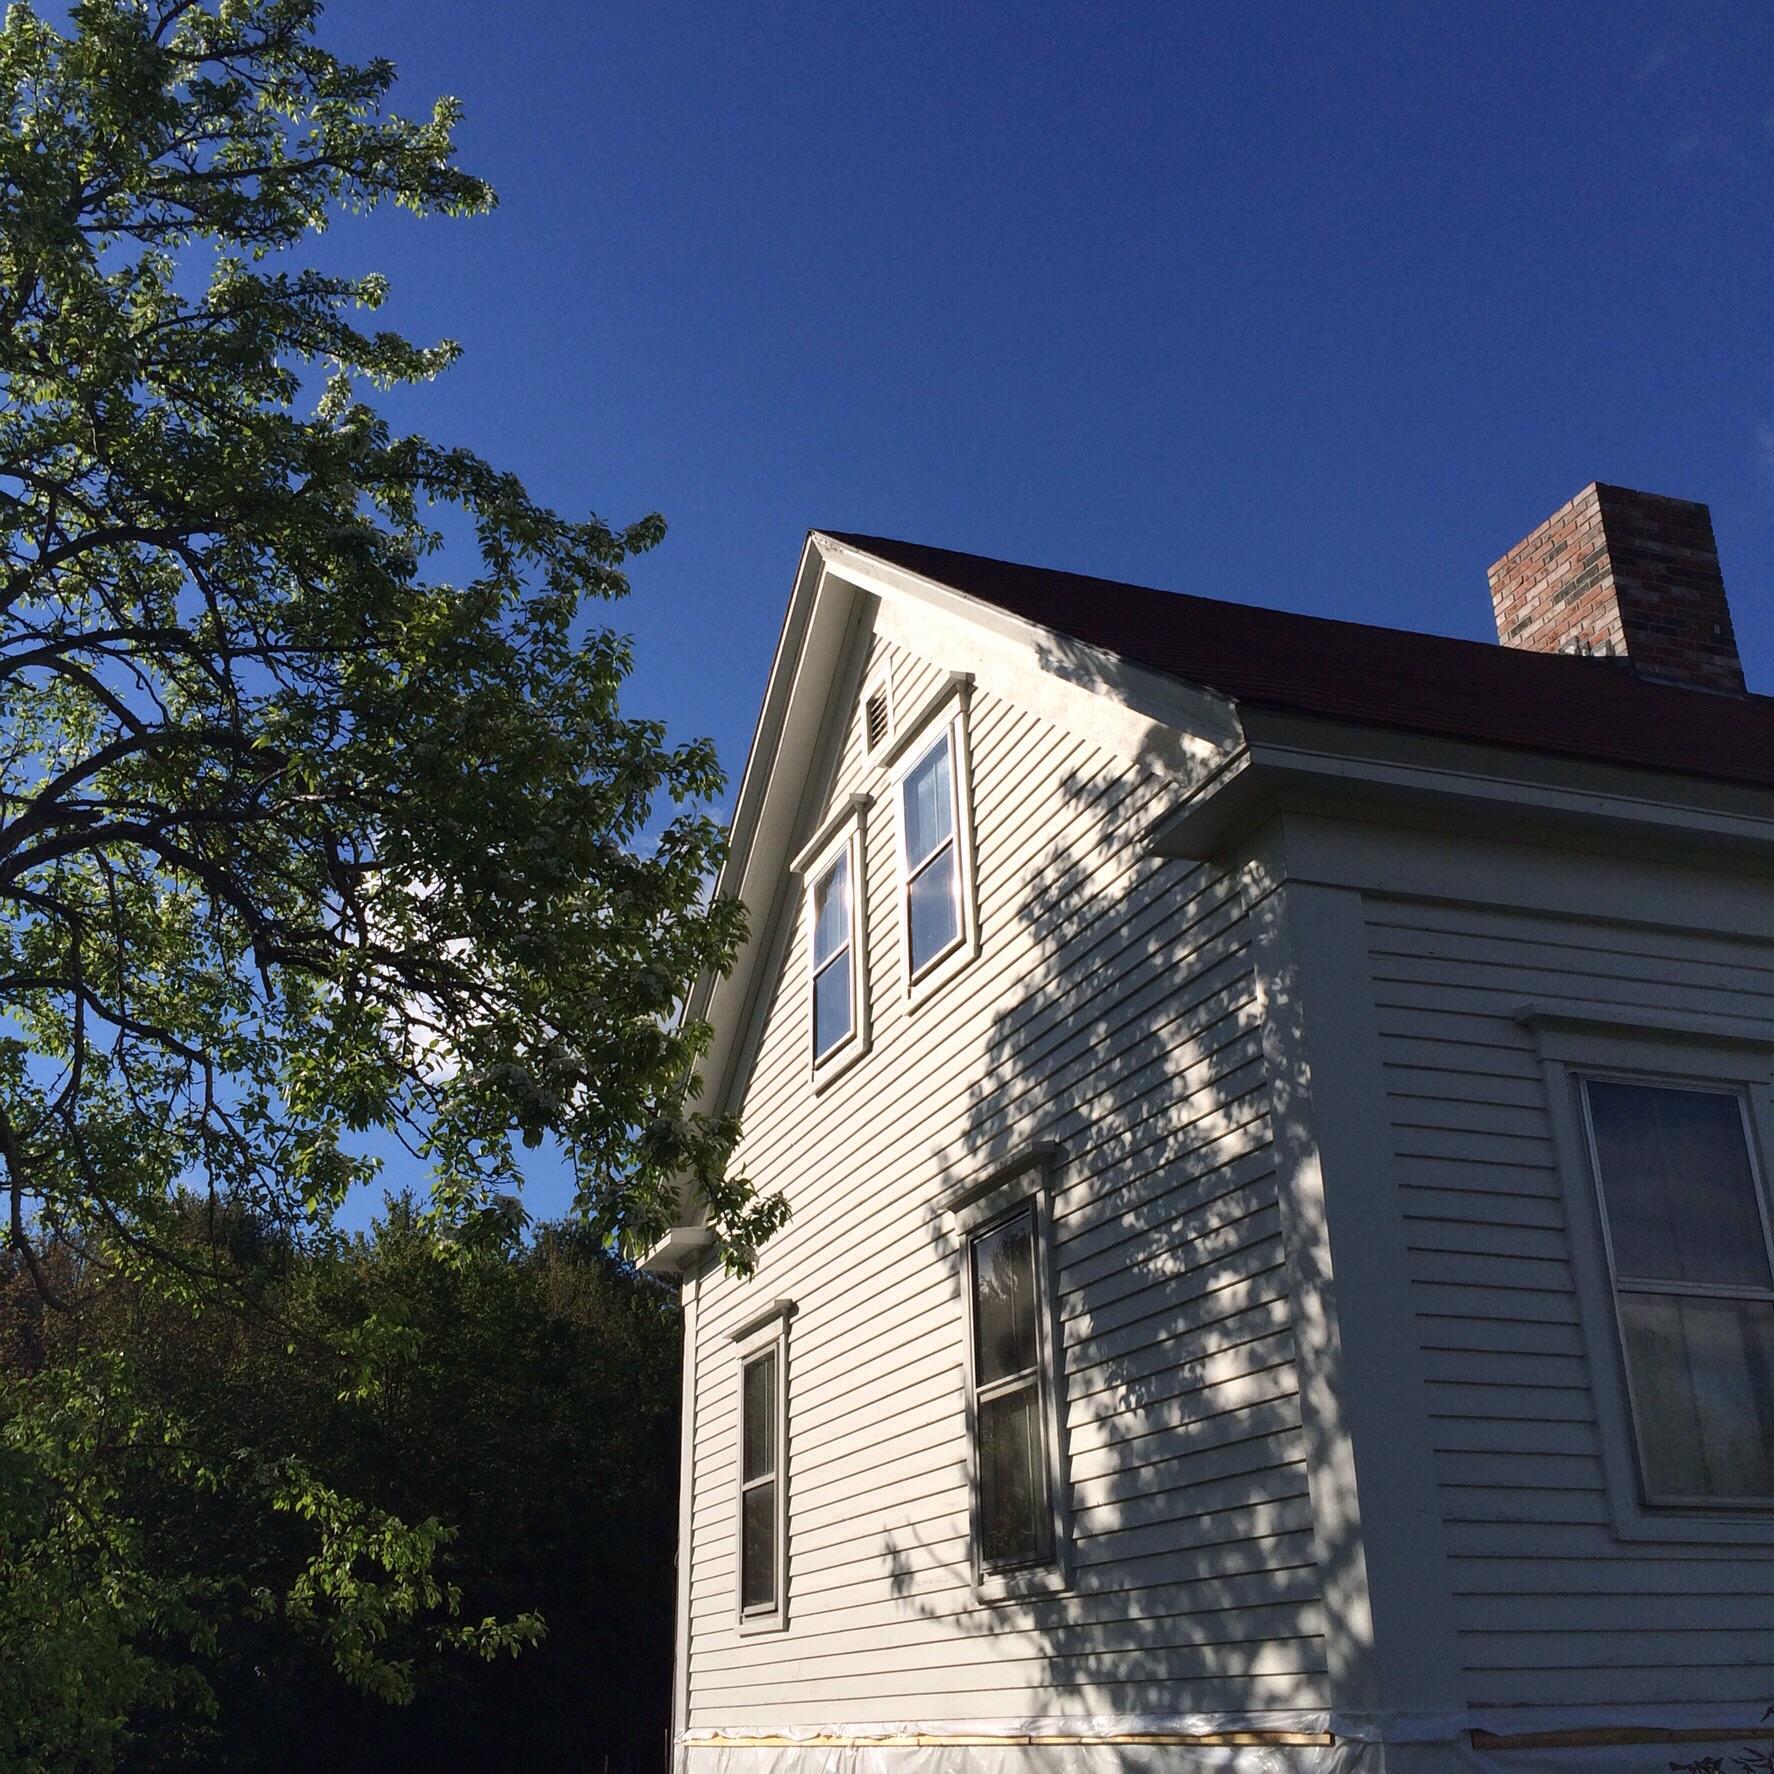 Pear tree and farmhouse.